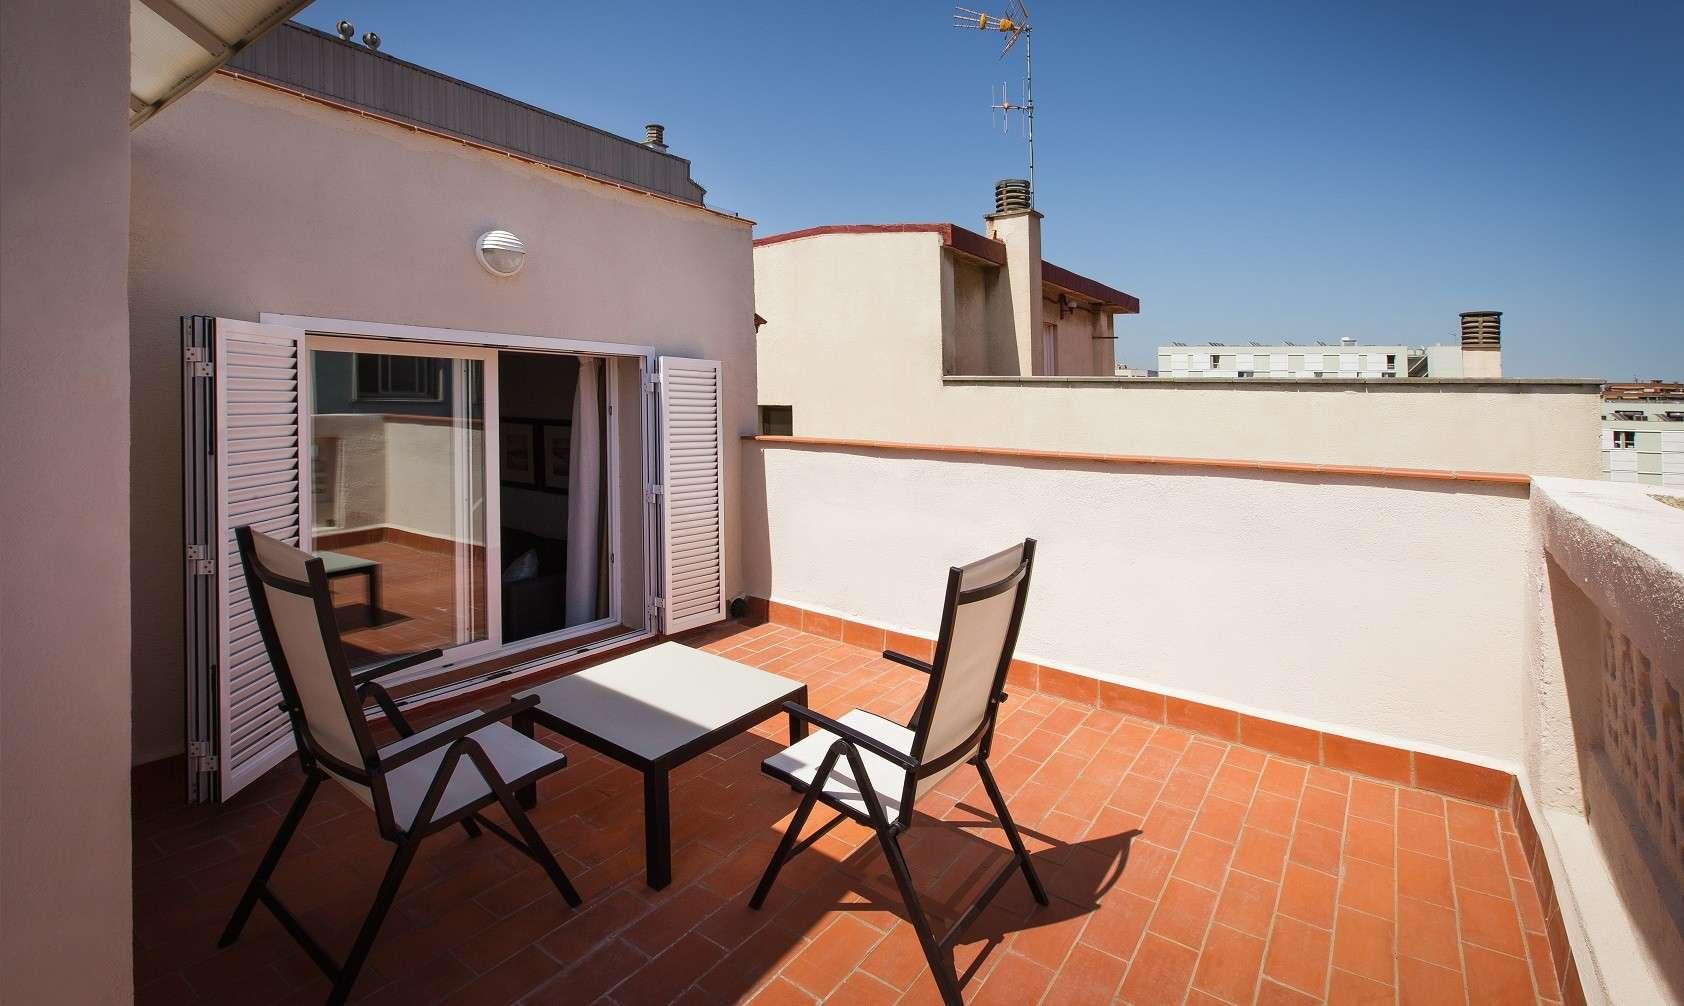 Dailyflats Sagrada Familia 1-bedroom (1-4 adults) Attic apartment in Barcelona 3